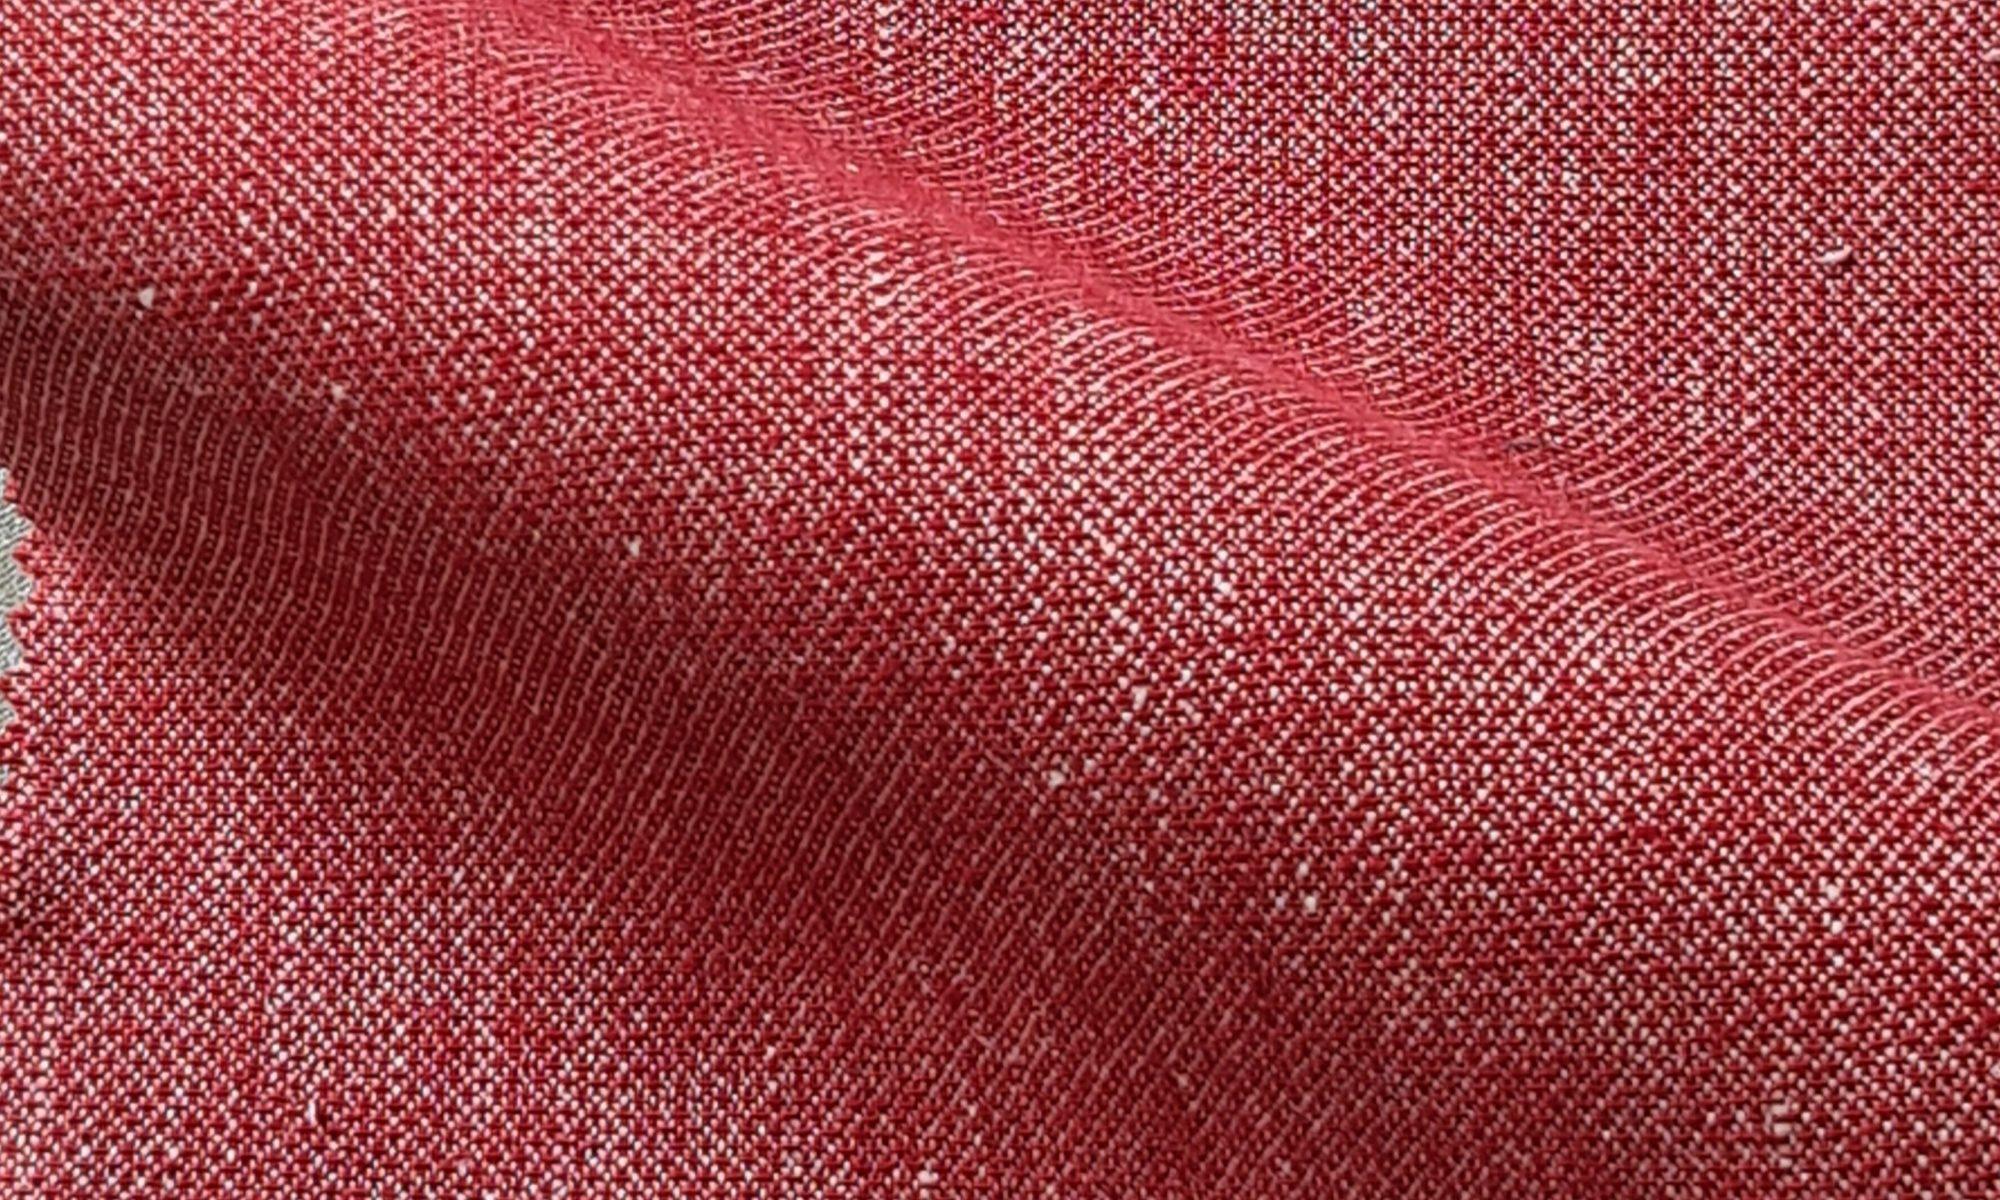 7599 linen blend red jacket skirt pant WIDTH cm145 WEIGHT gr270 - gr186 square meter - COMPOSITION 51 Cotton 49 Linen - 930mts